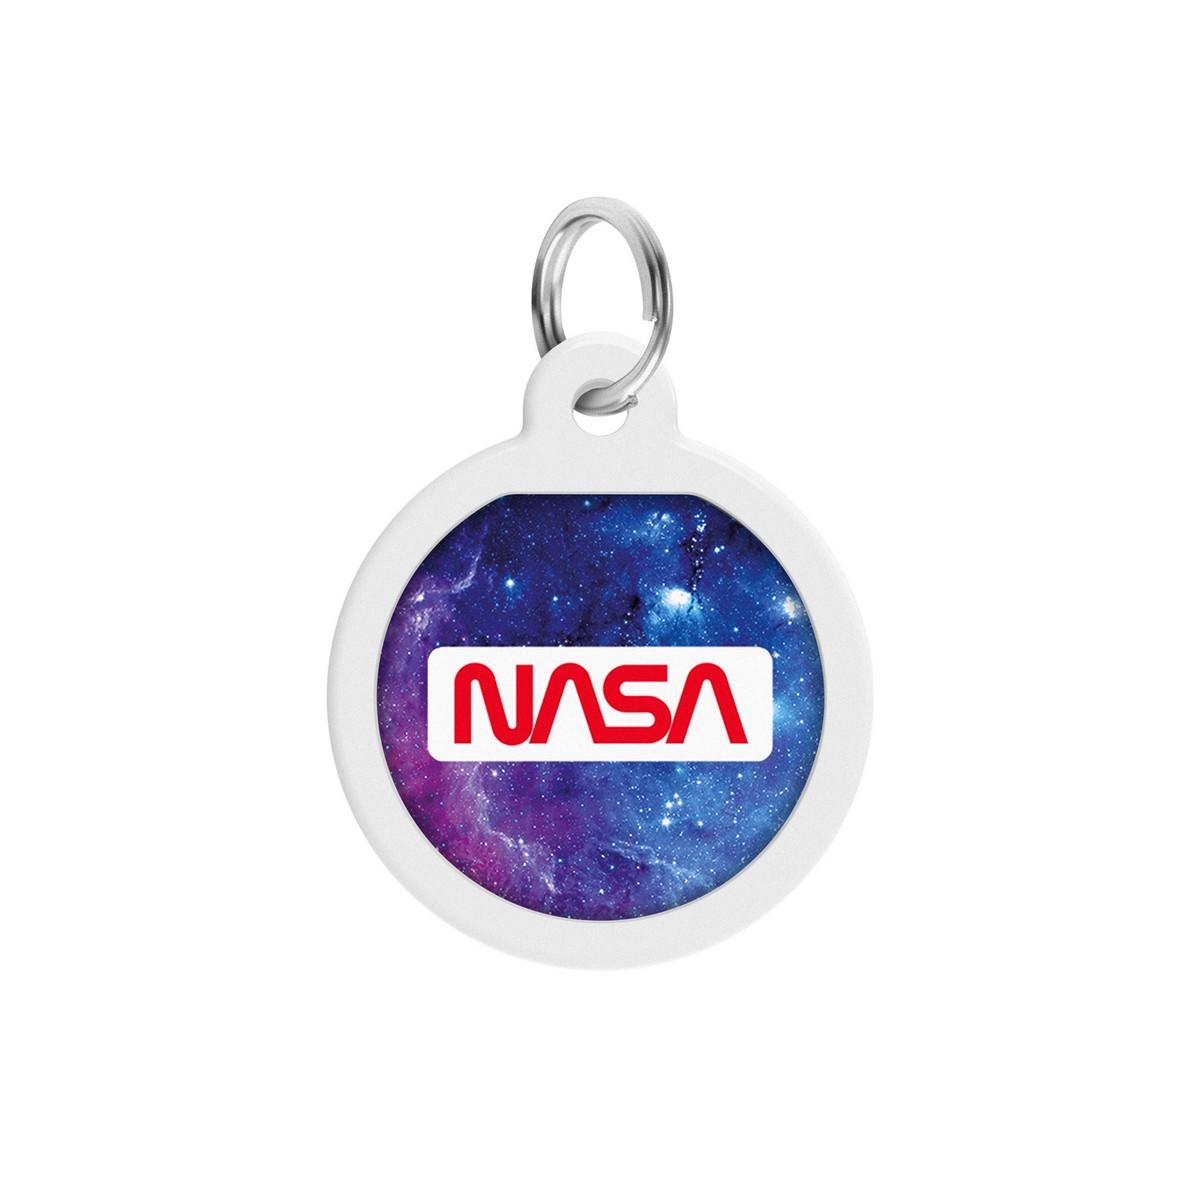 "Адресник WAUDOG Smart ID з QR паспортом, преміум, малюнок ""NASA21"", кістка"